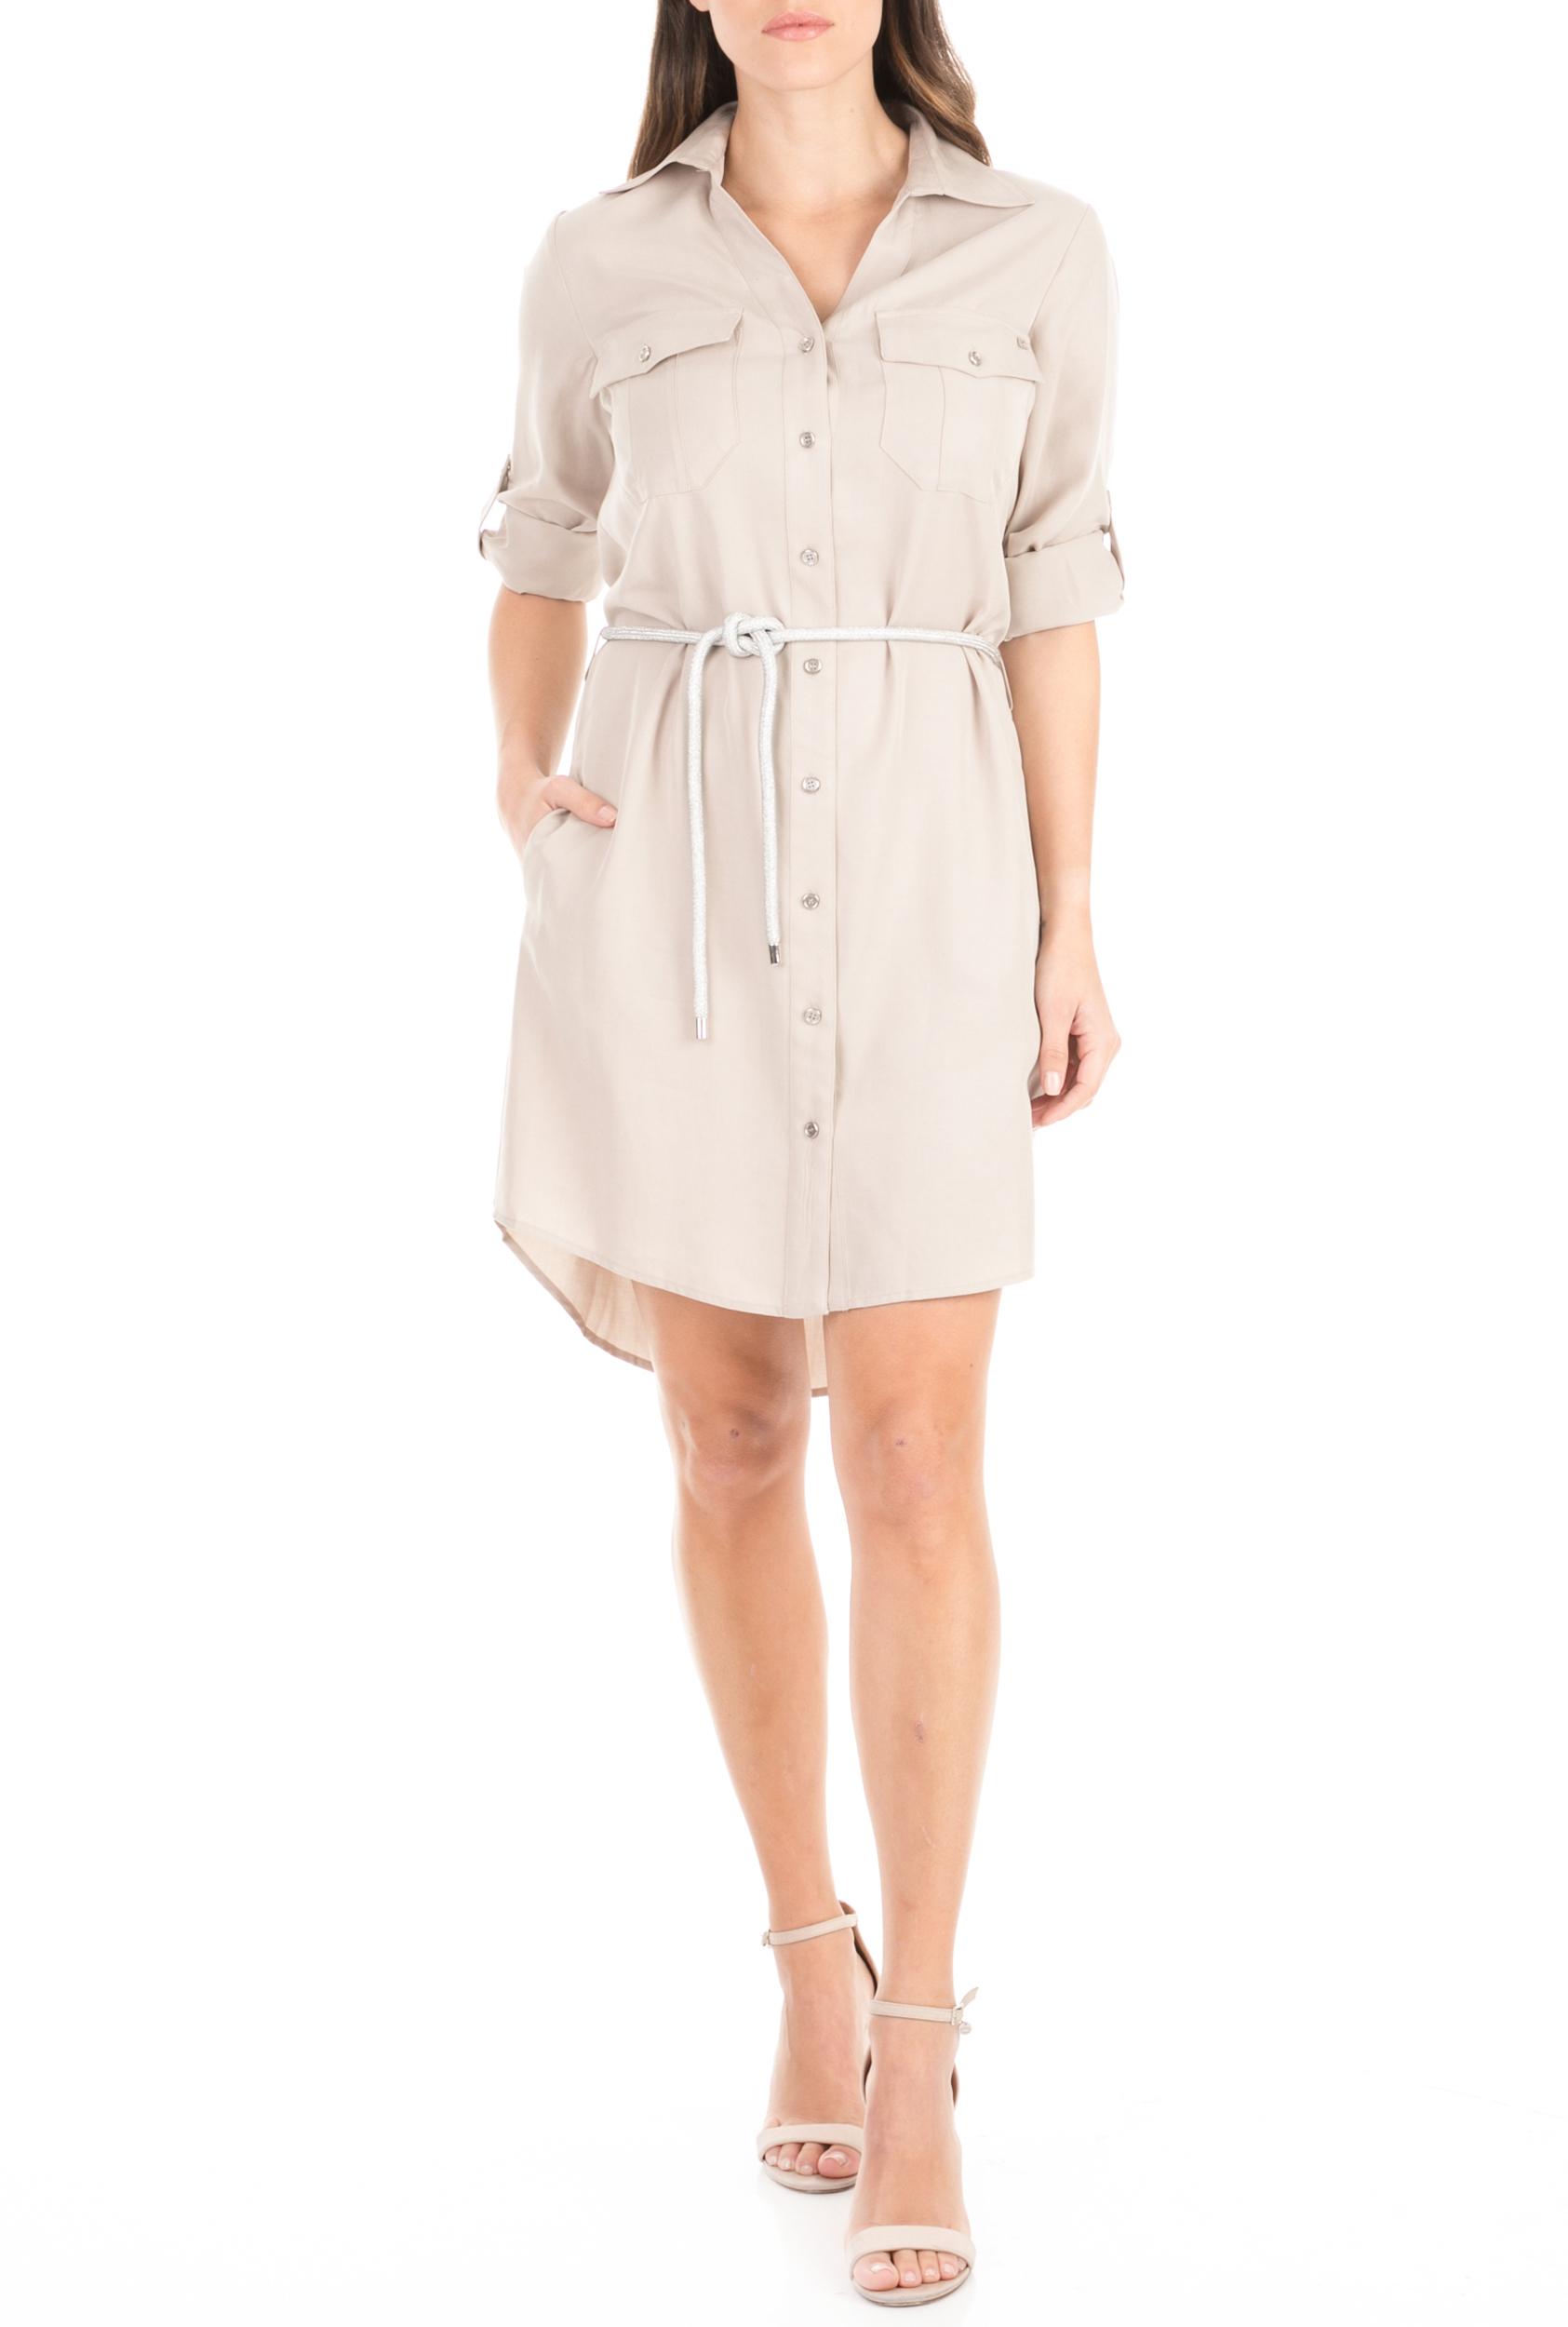 KOCCA - Γυναικείο φόρεμα KOCCA EGELIA μπεζ γυναικεία ρούχα φόρεματα μίνι